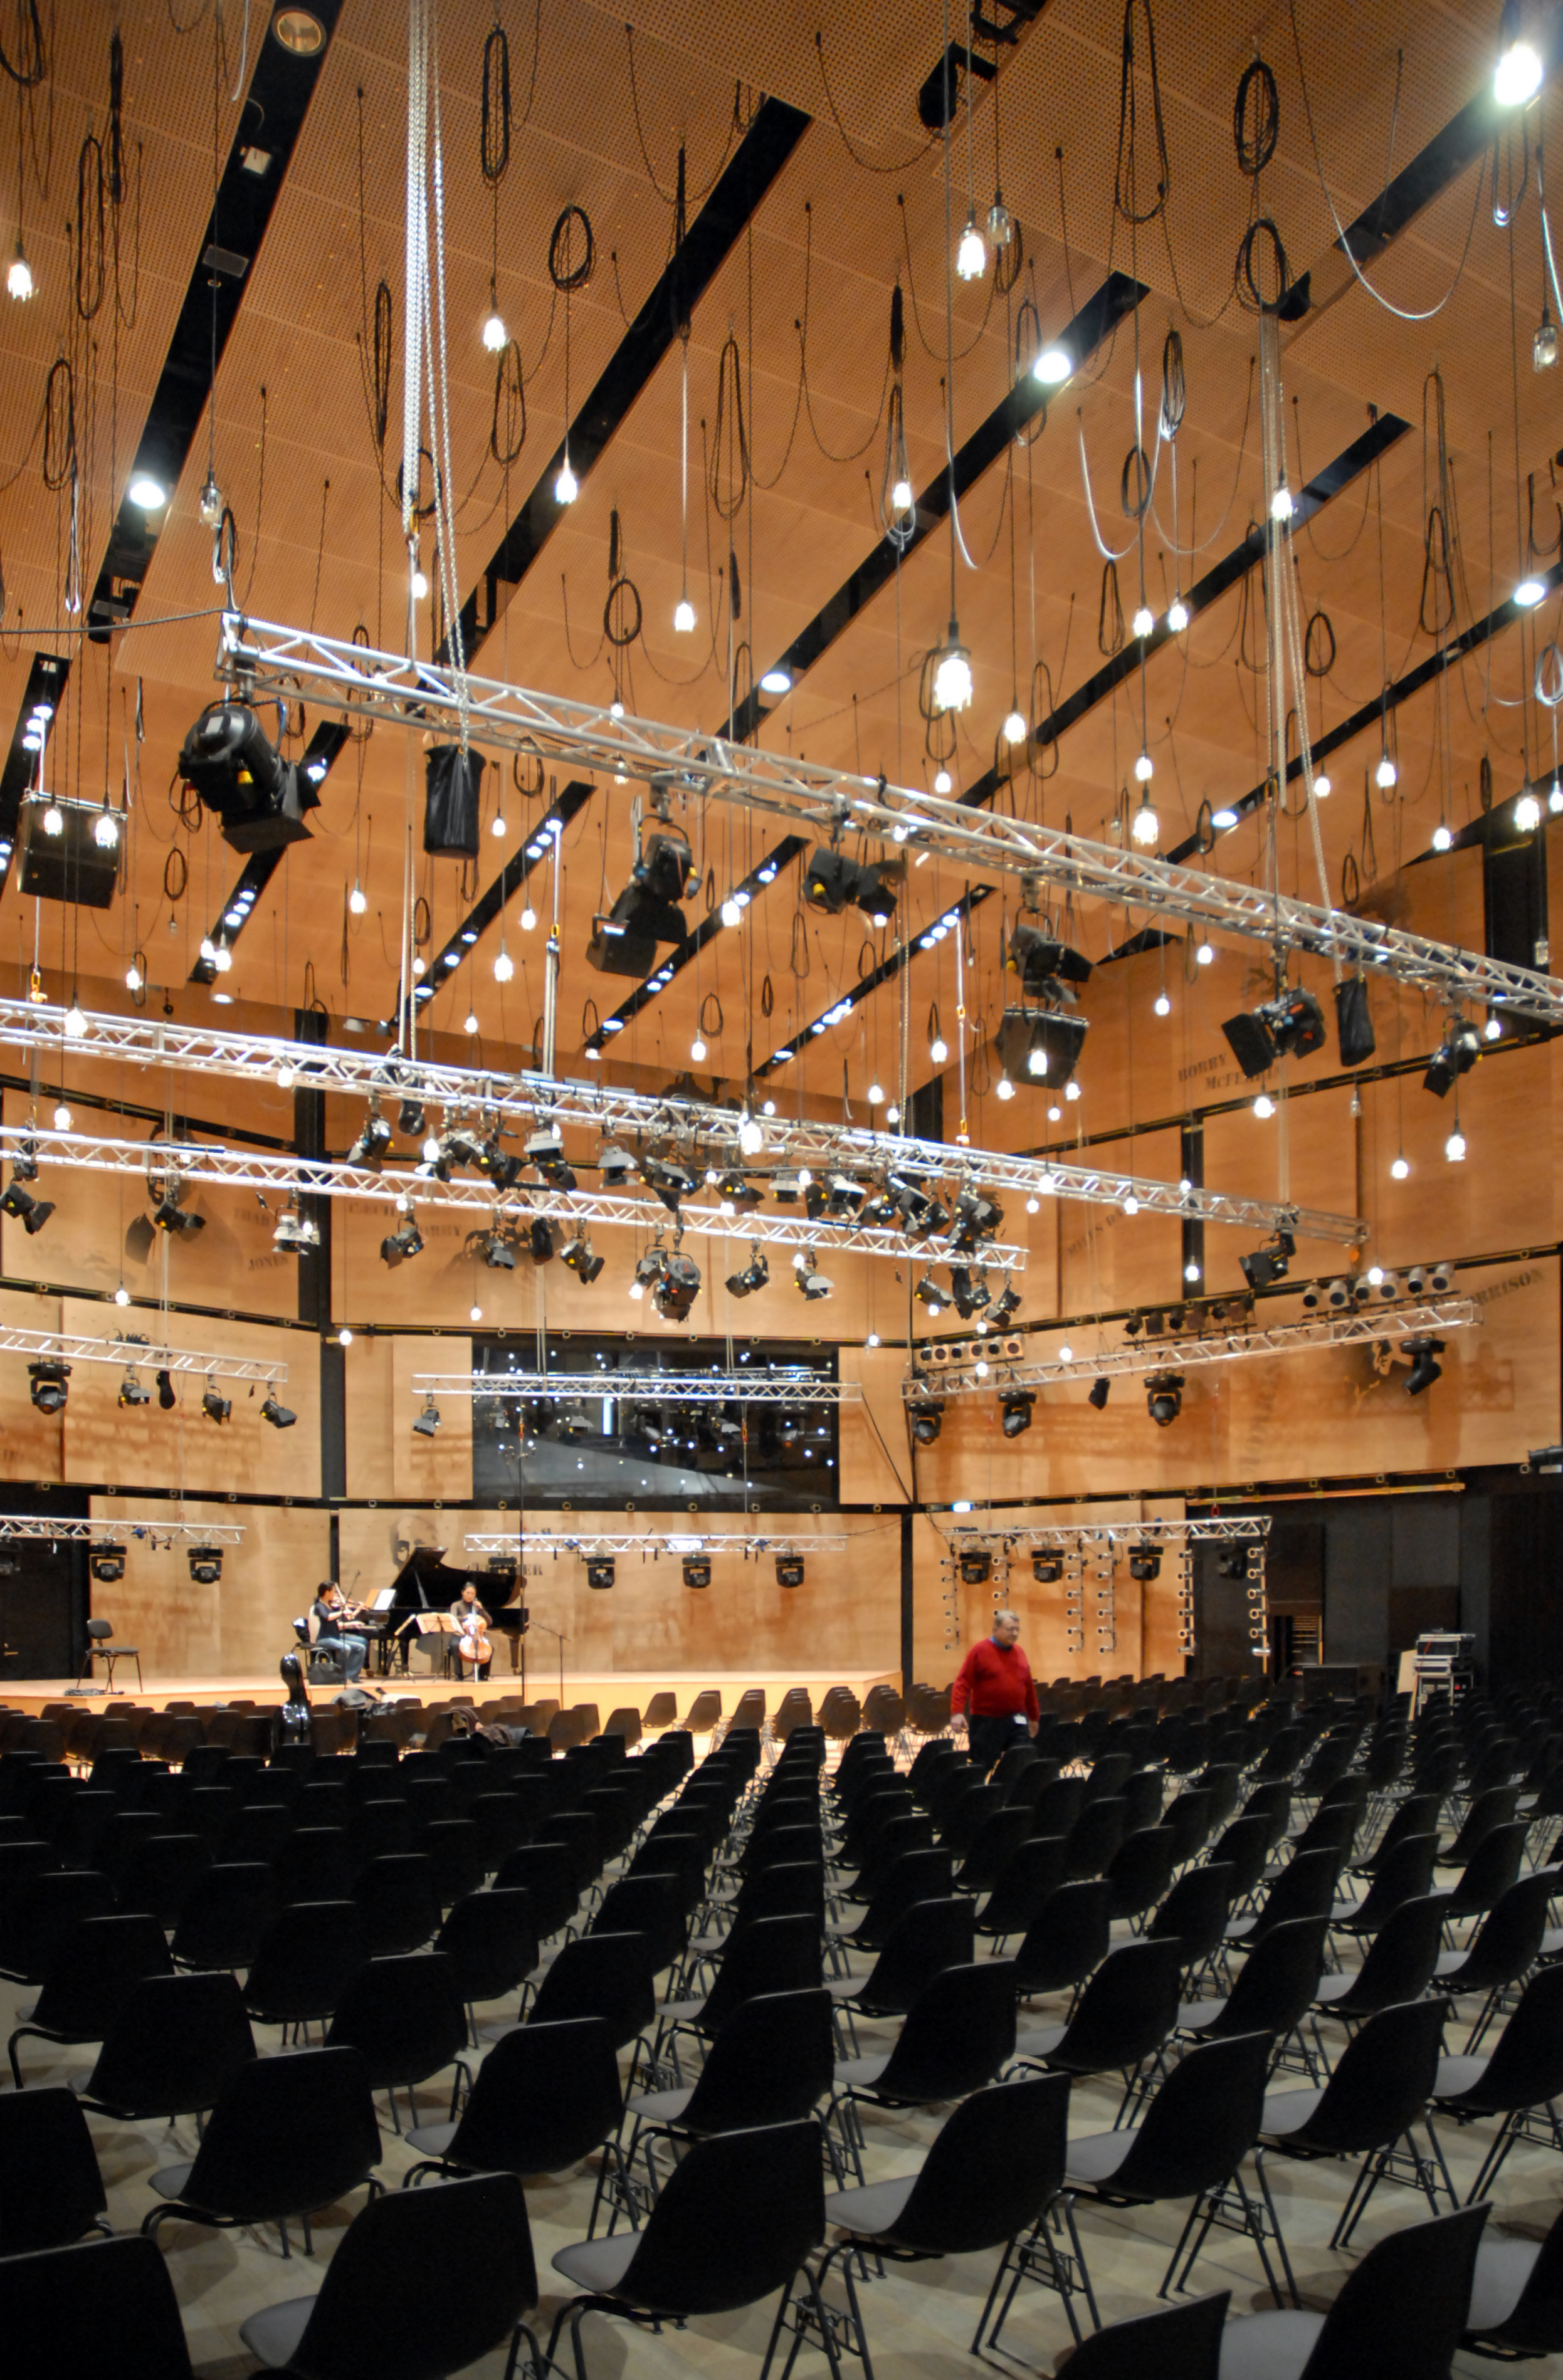 file studio 2 copenhagen concert wikimedia commons. Black Bedroom Furniture Sets. Home Design Ideas